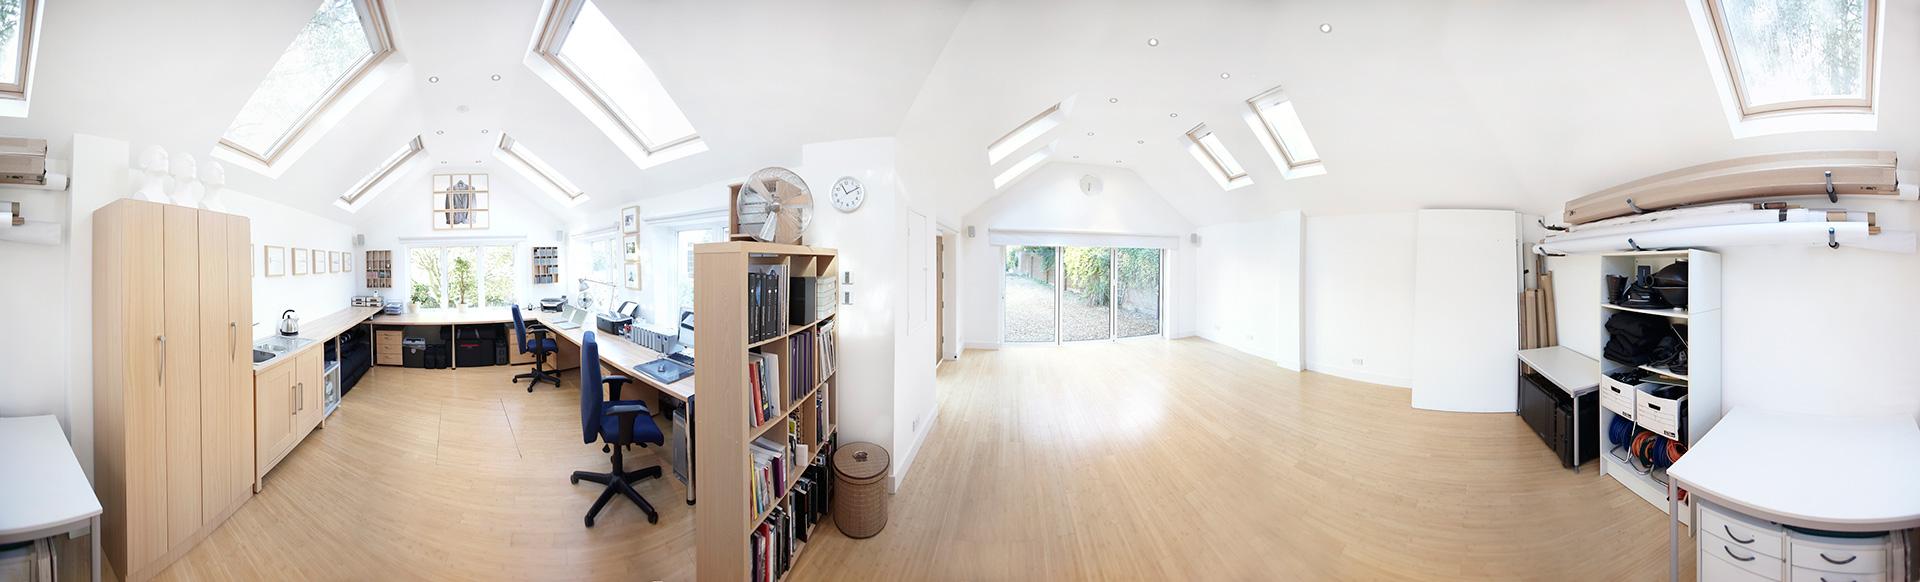 Adam Gault Photography Studio